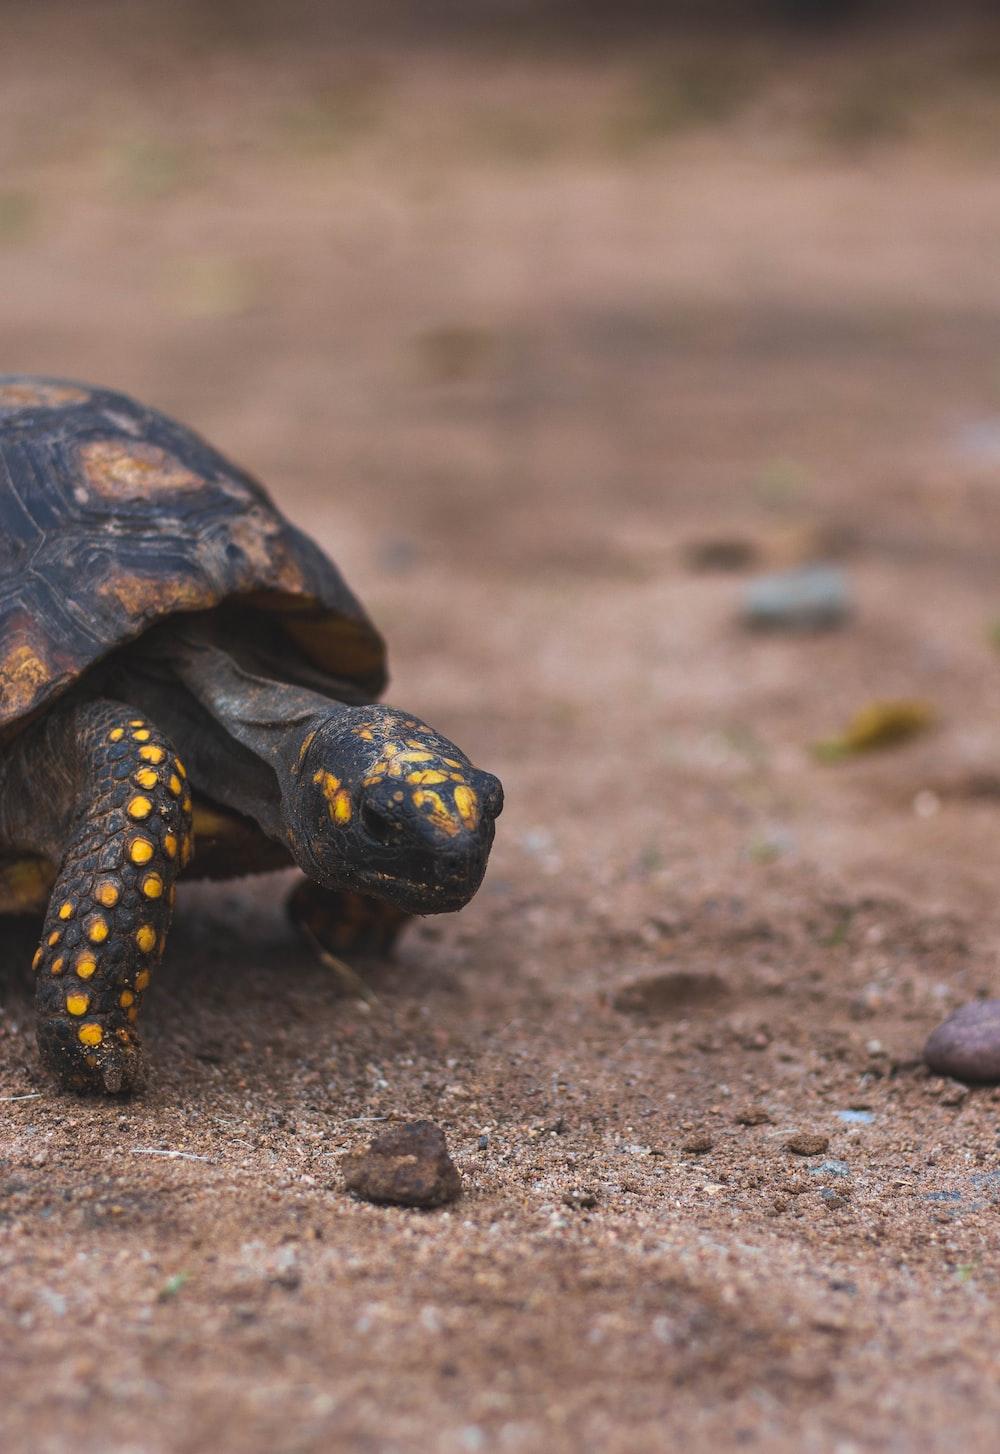 shallow focus photo of black turtle